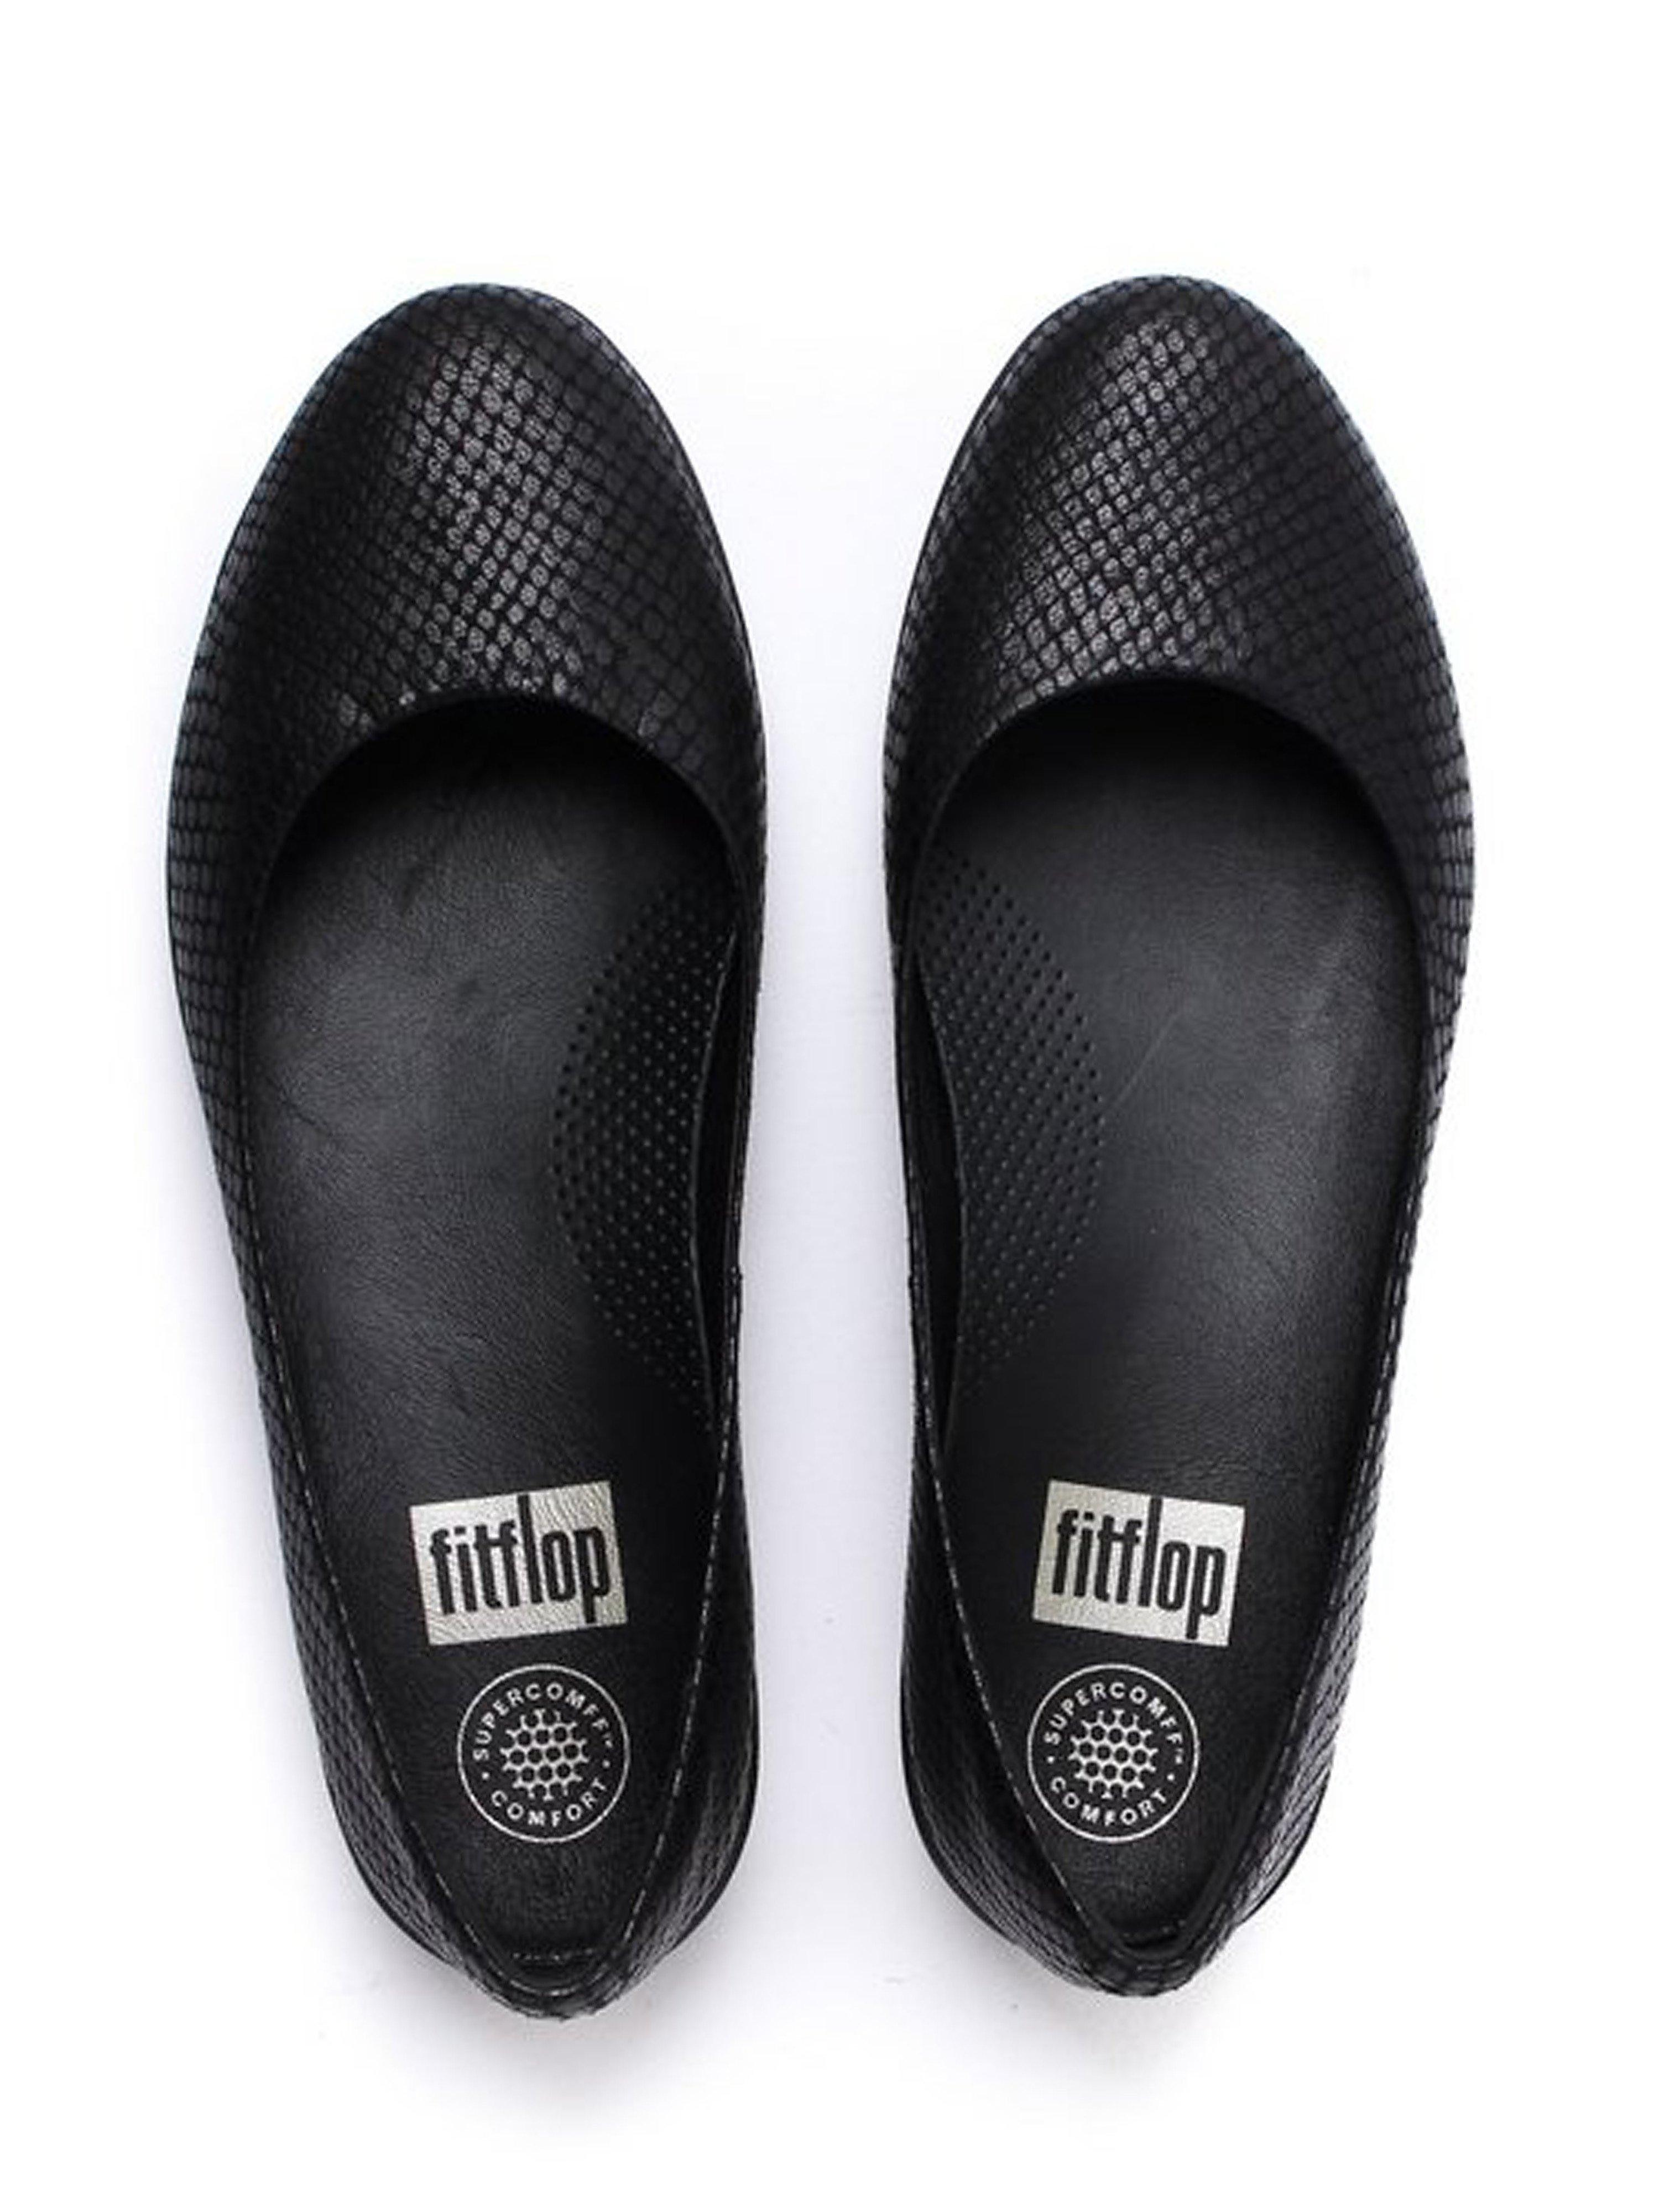 FitFlop Women's Superballerina Shoes - Black Snake